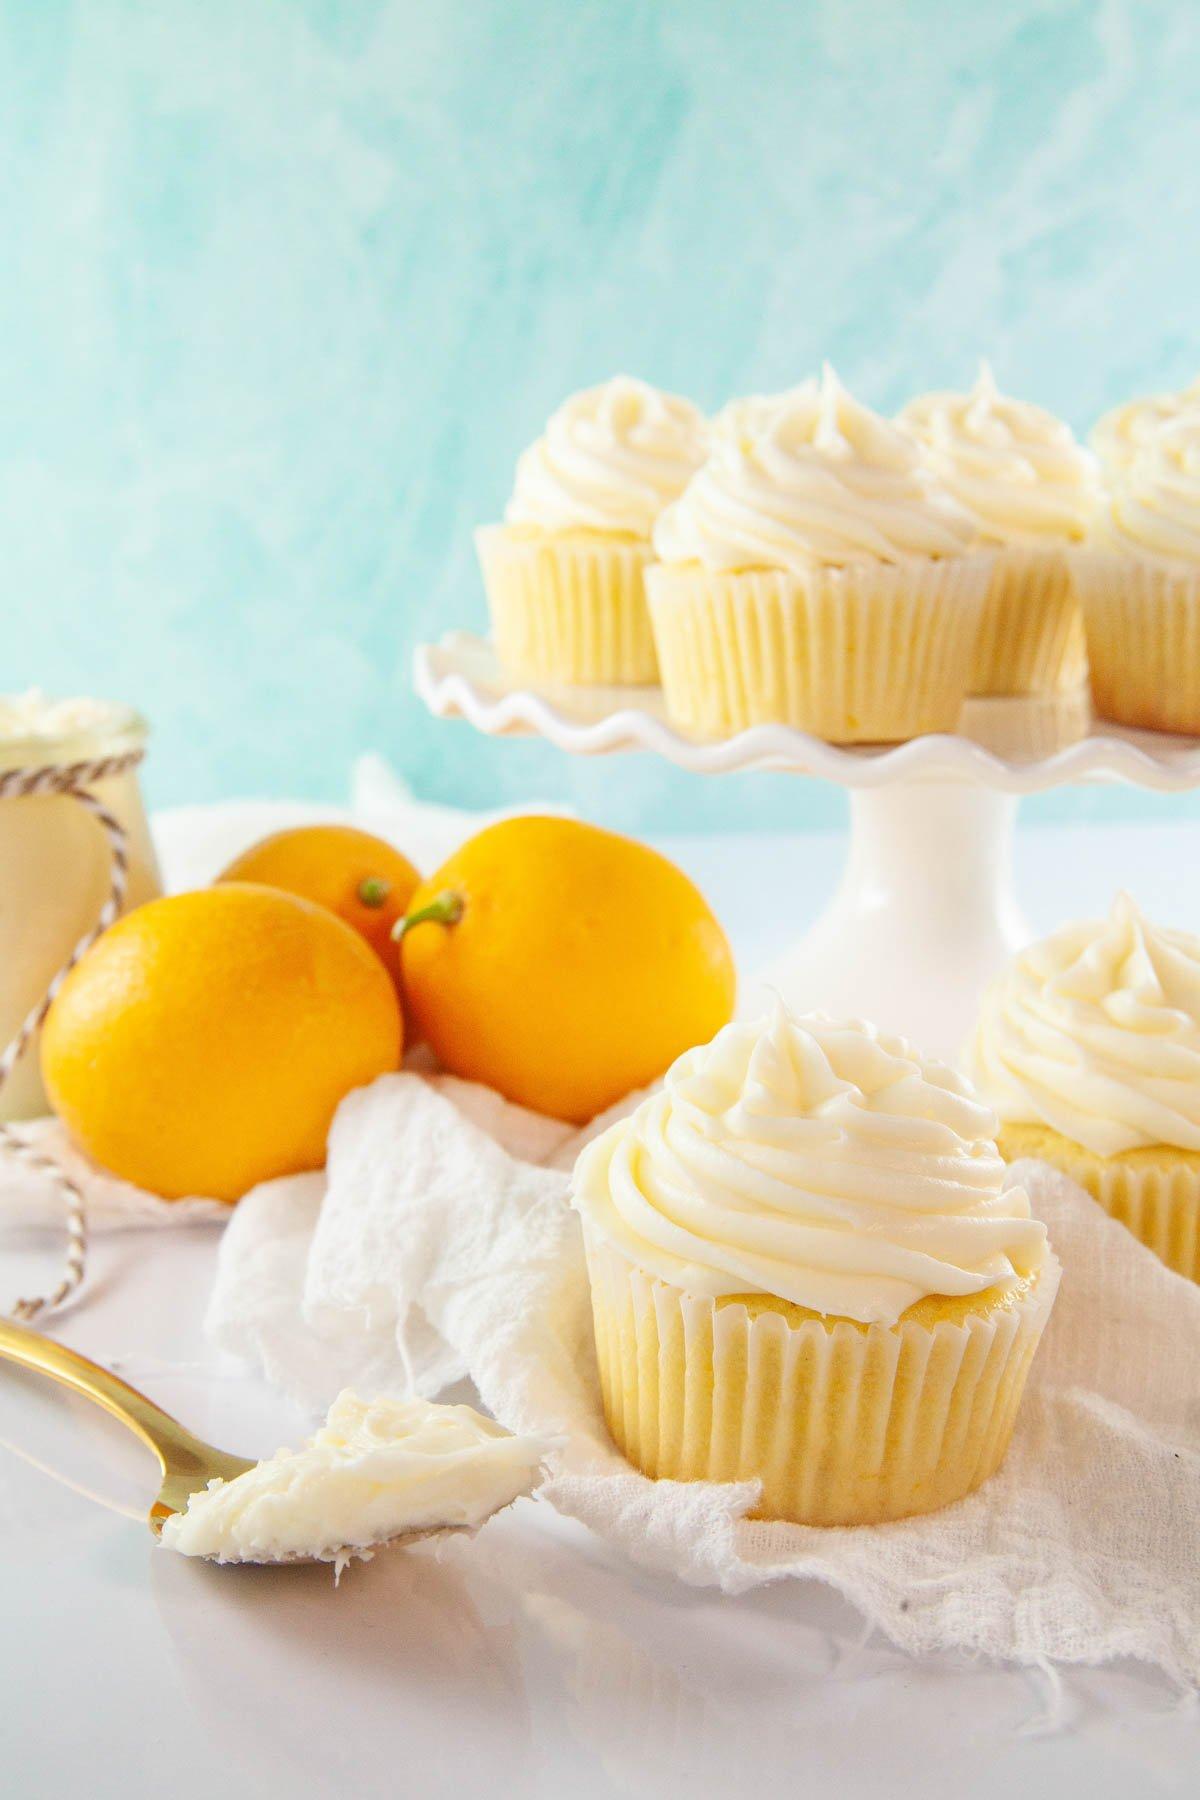 cake stand with lemon cupcakes